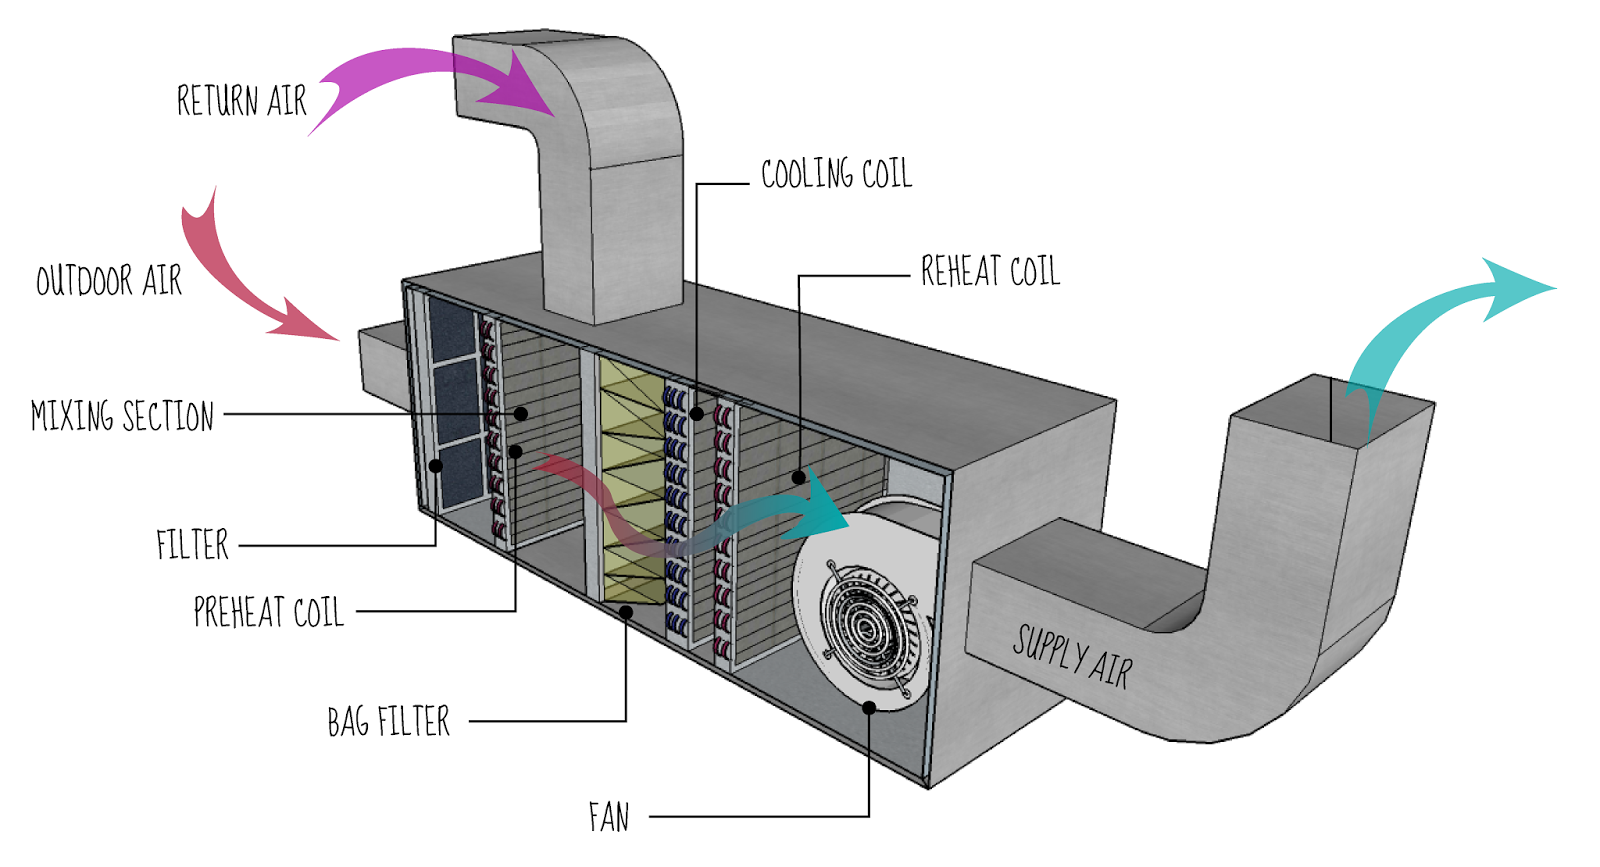 medium resolution of basic principles of a hvac system engineering updates rh teenknowlege blogspot com commercial hvac diagram hvac plenum diagram